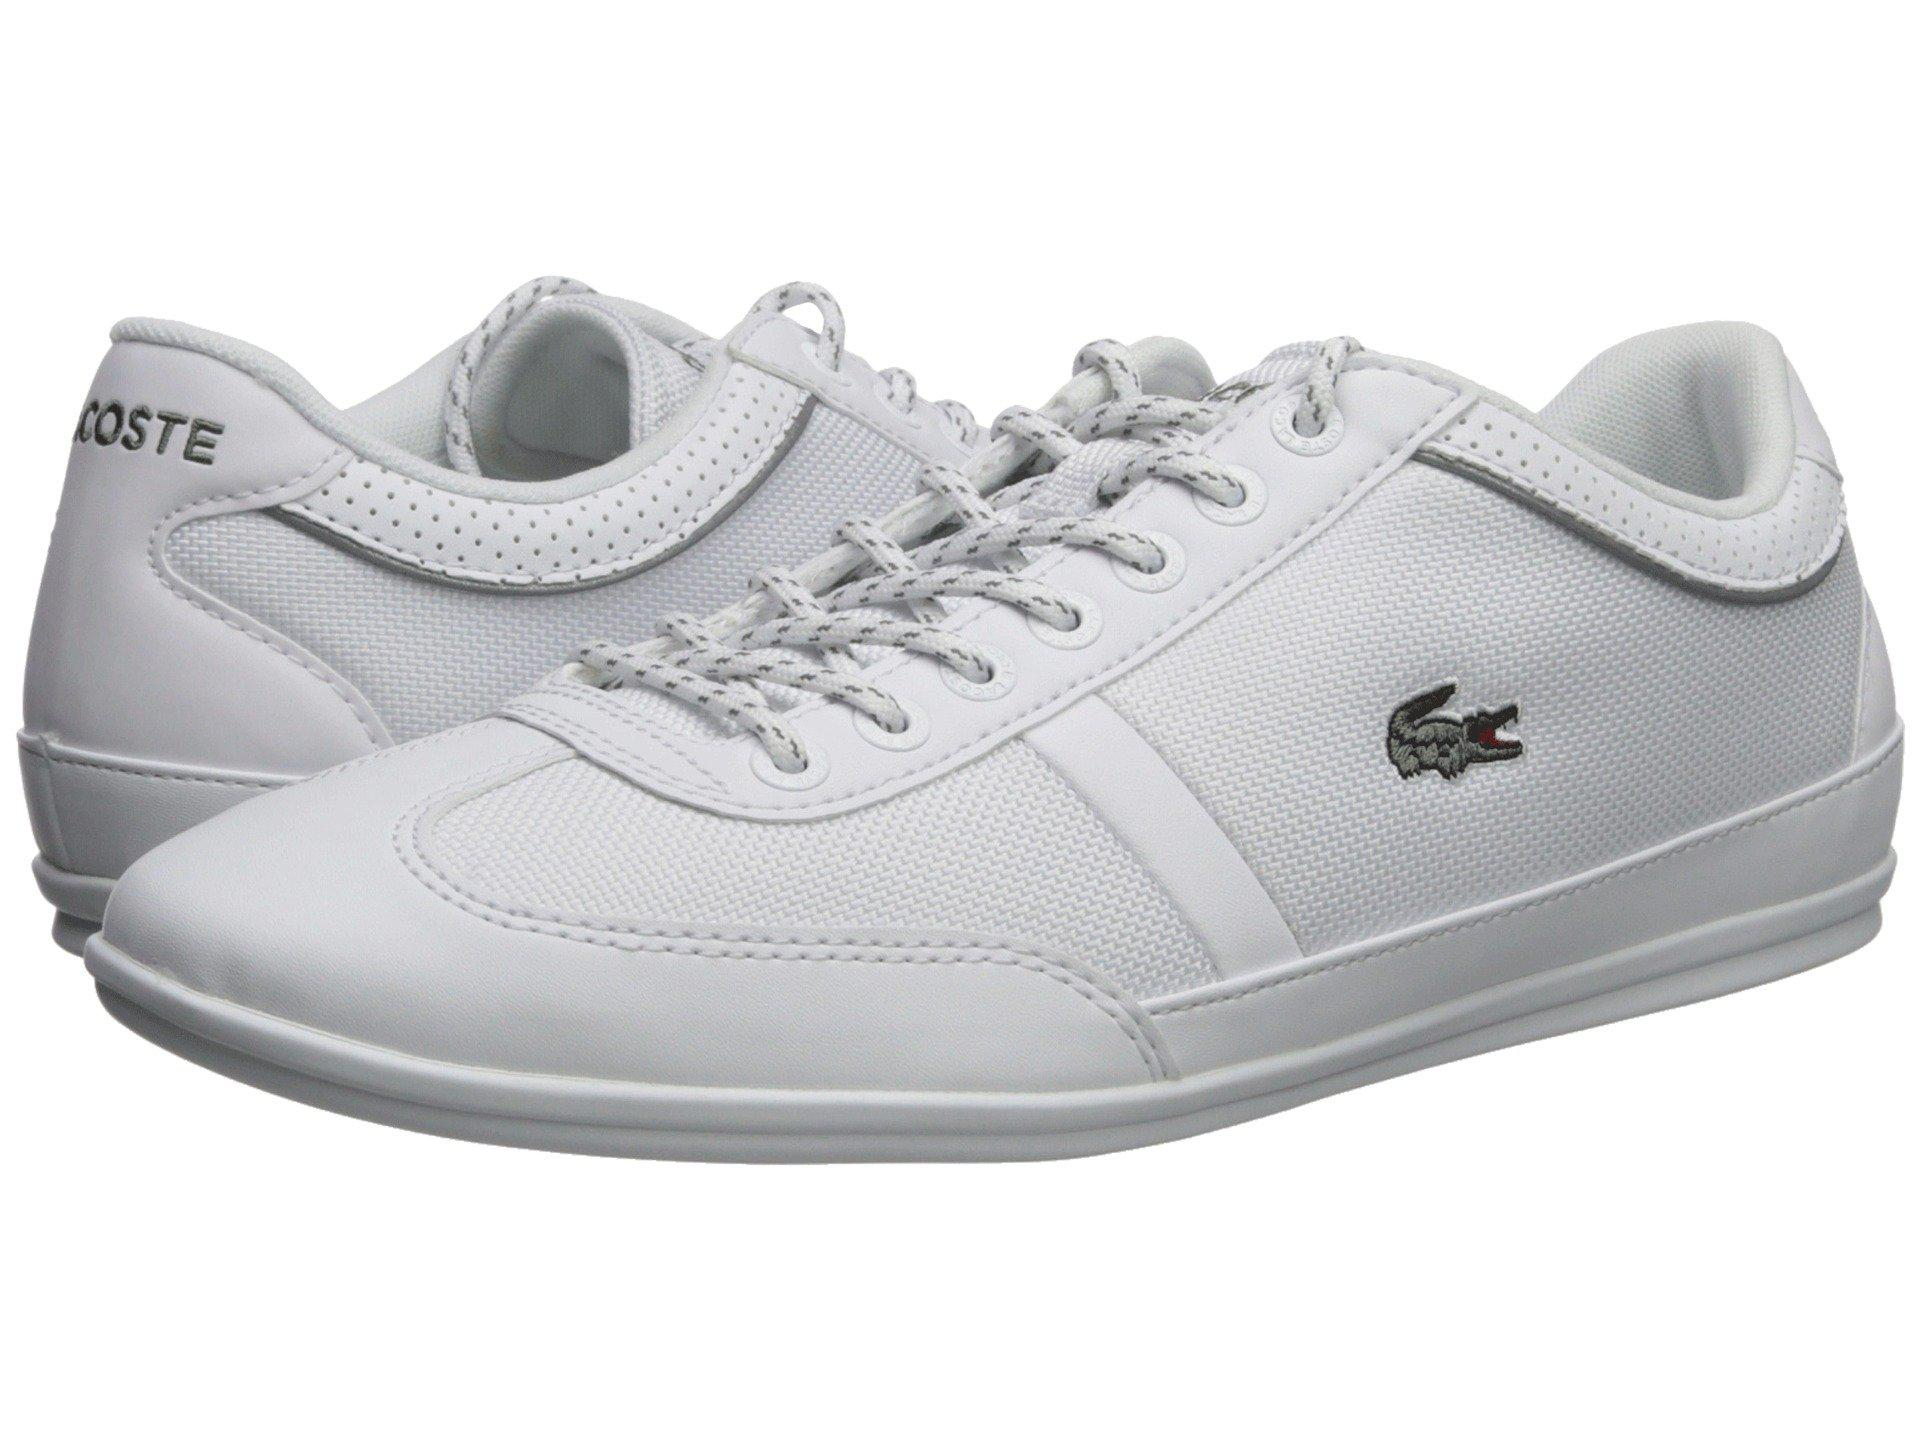 49c9408583b239 Lyst - Lacoste Misano Sport 218 1 (white white) Men s Shoes in White ...